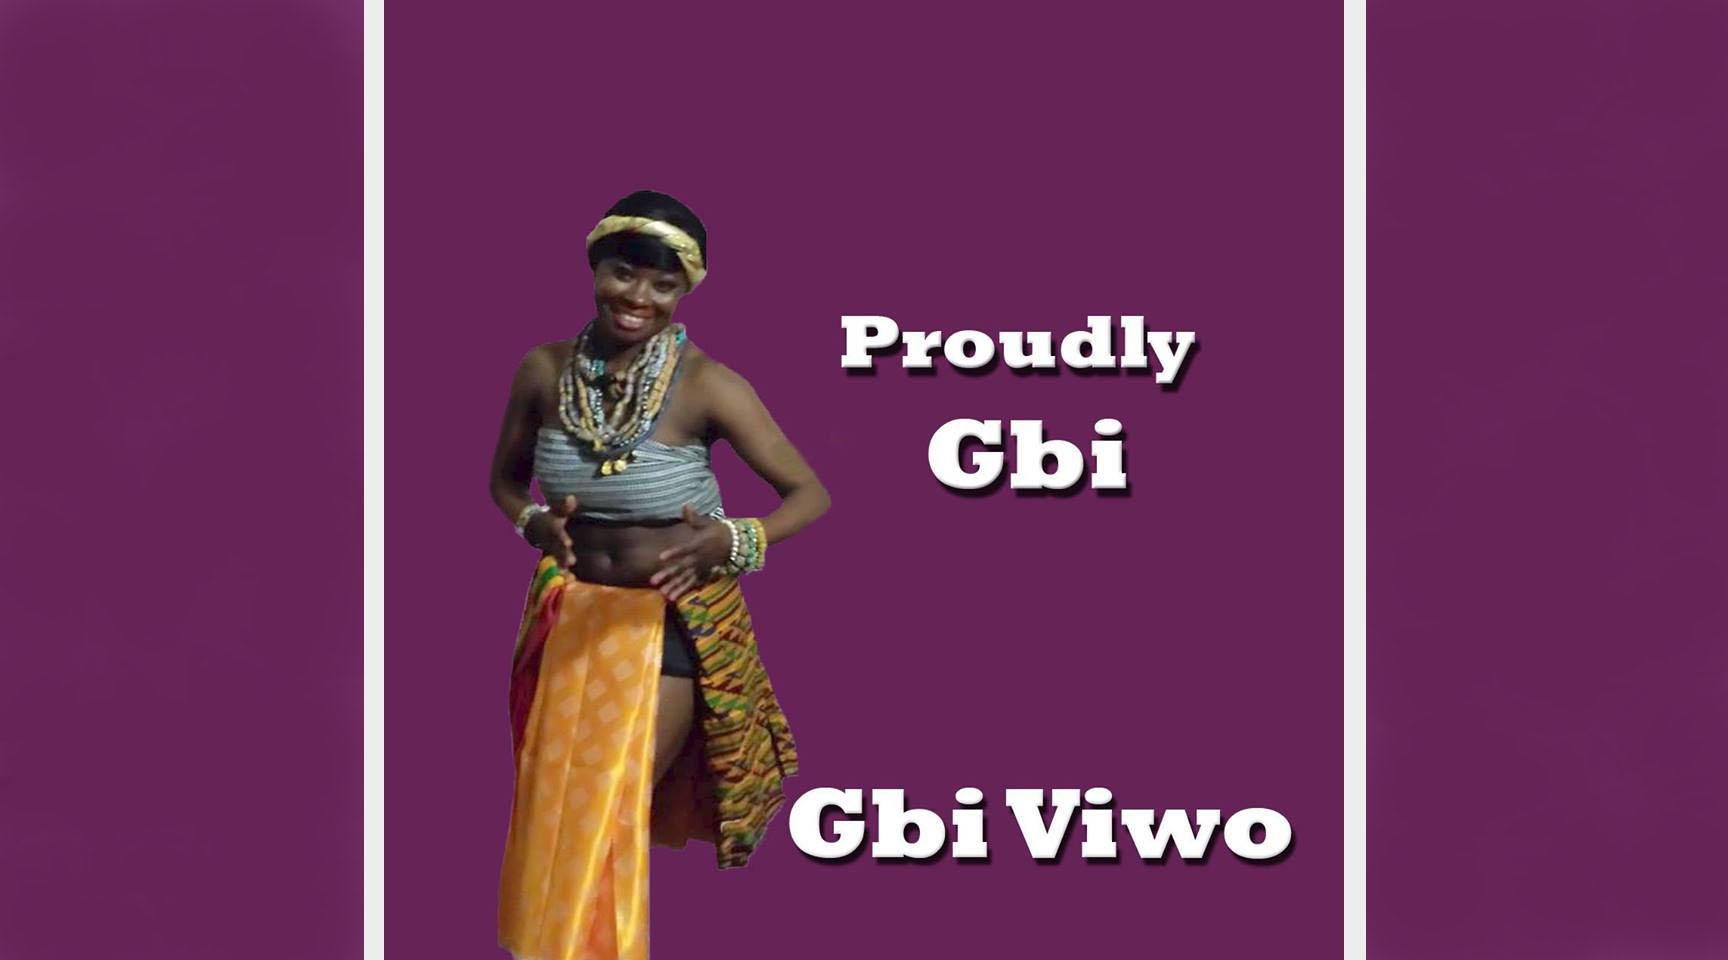 The Gbi Pride